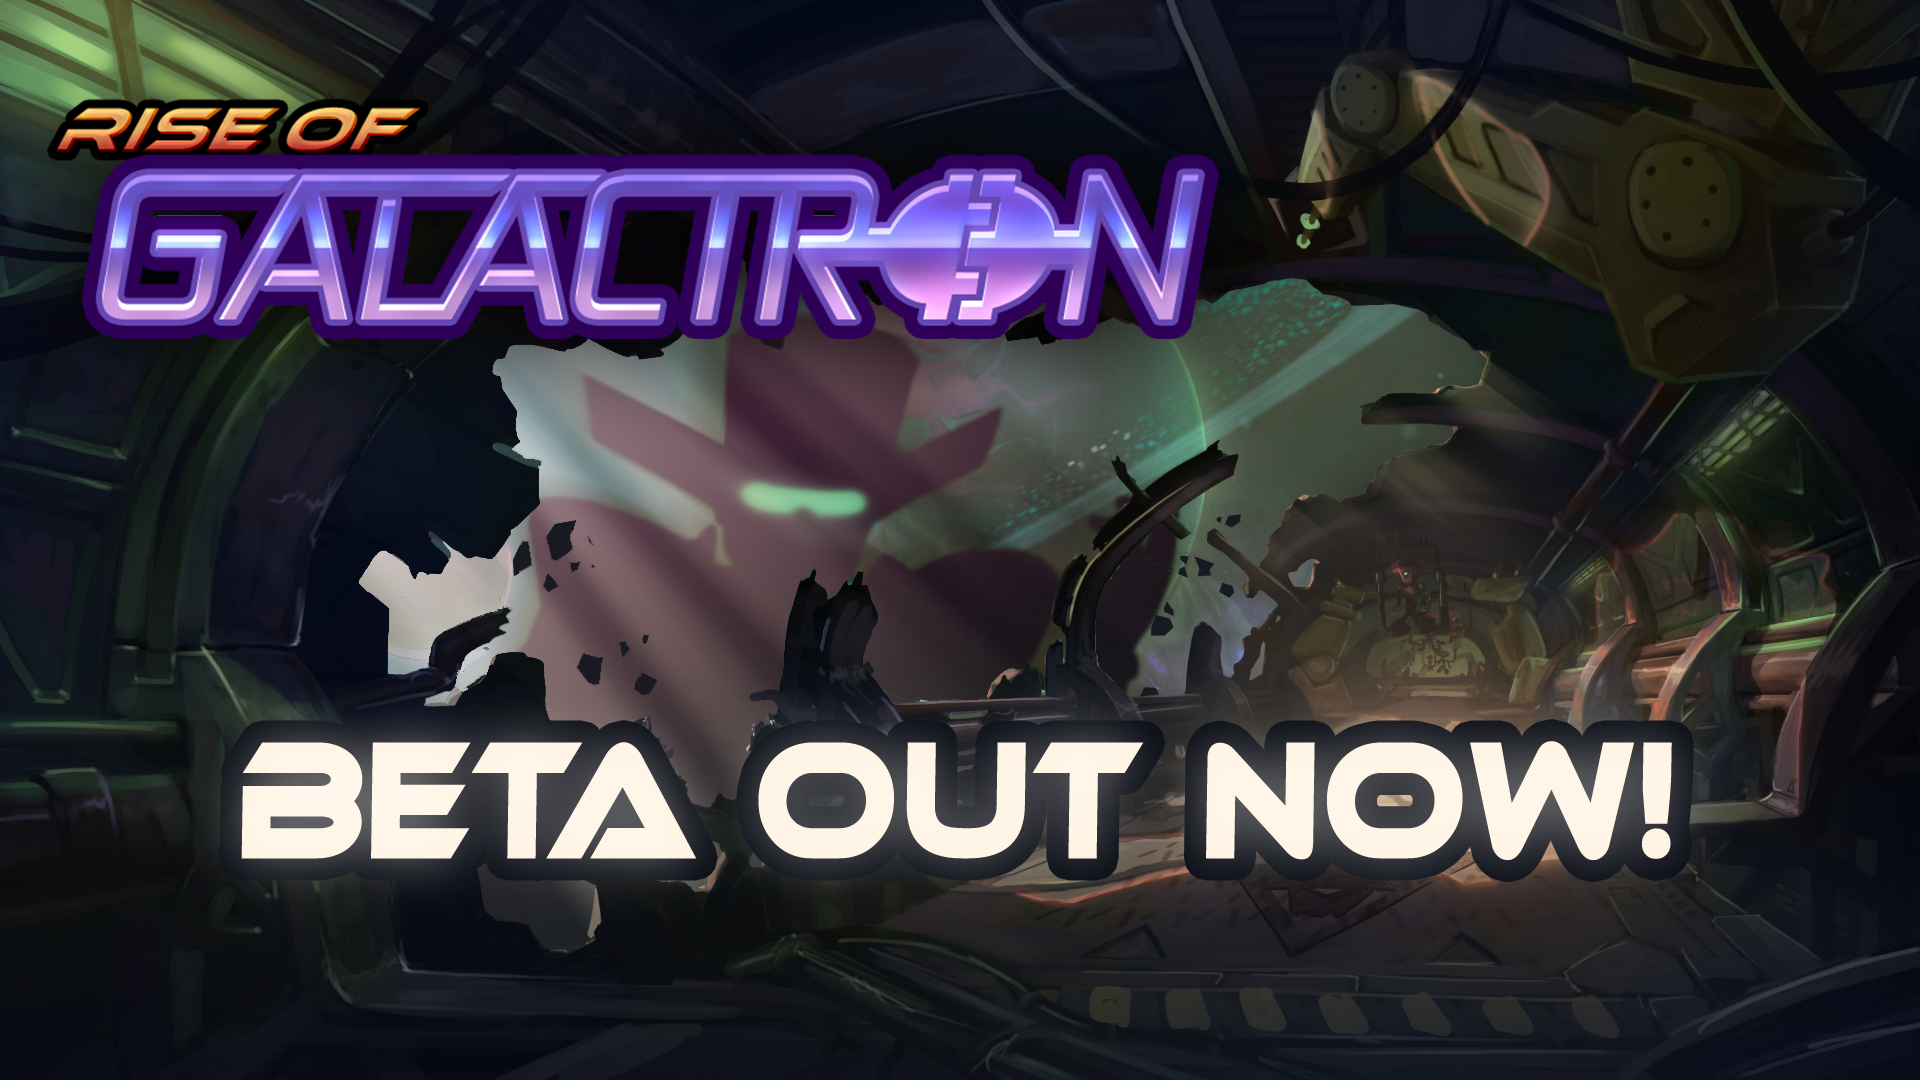 Rise of Galactron